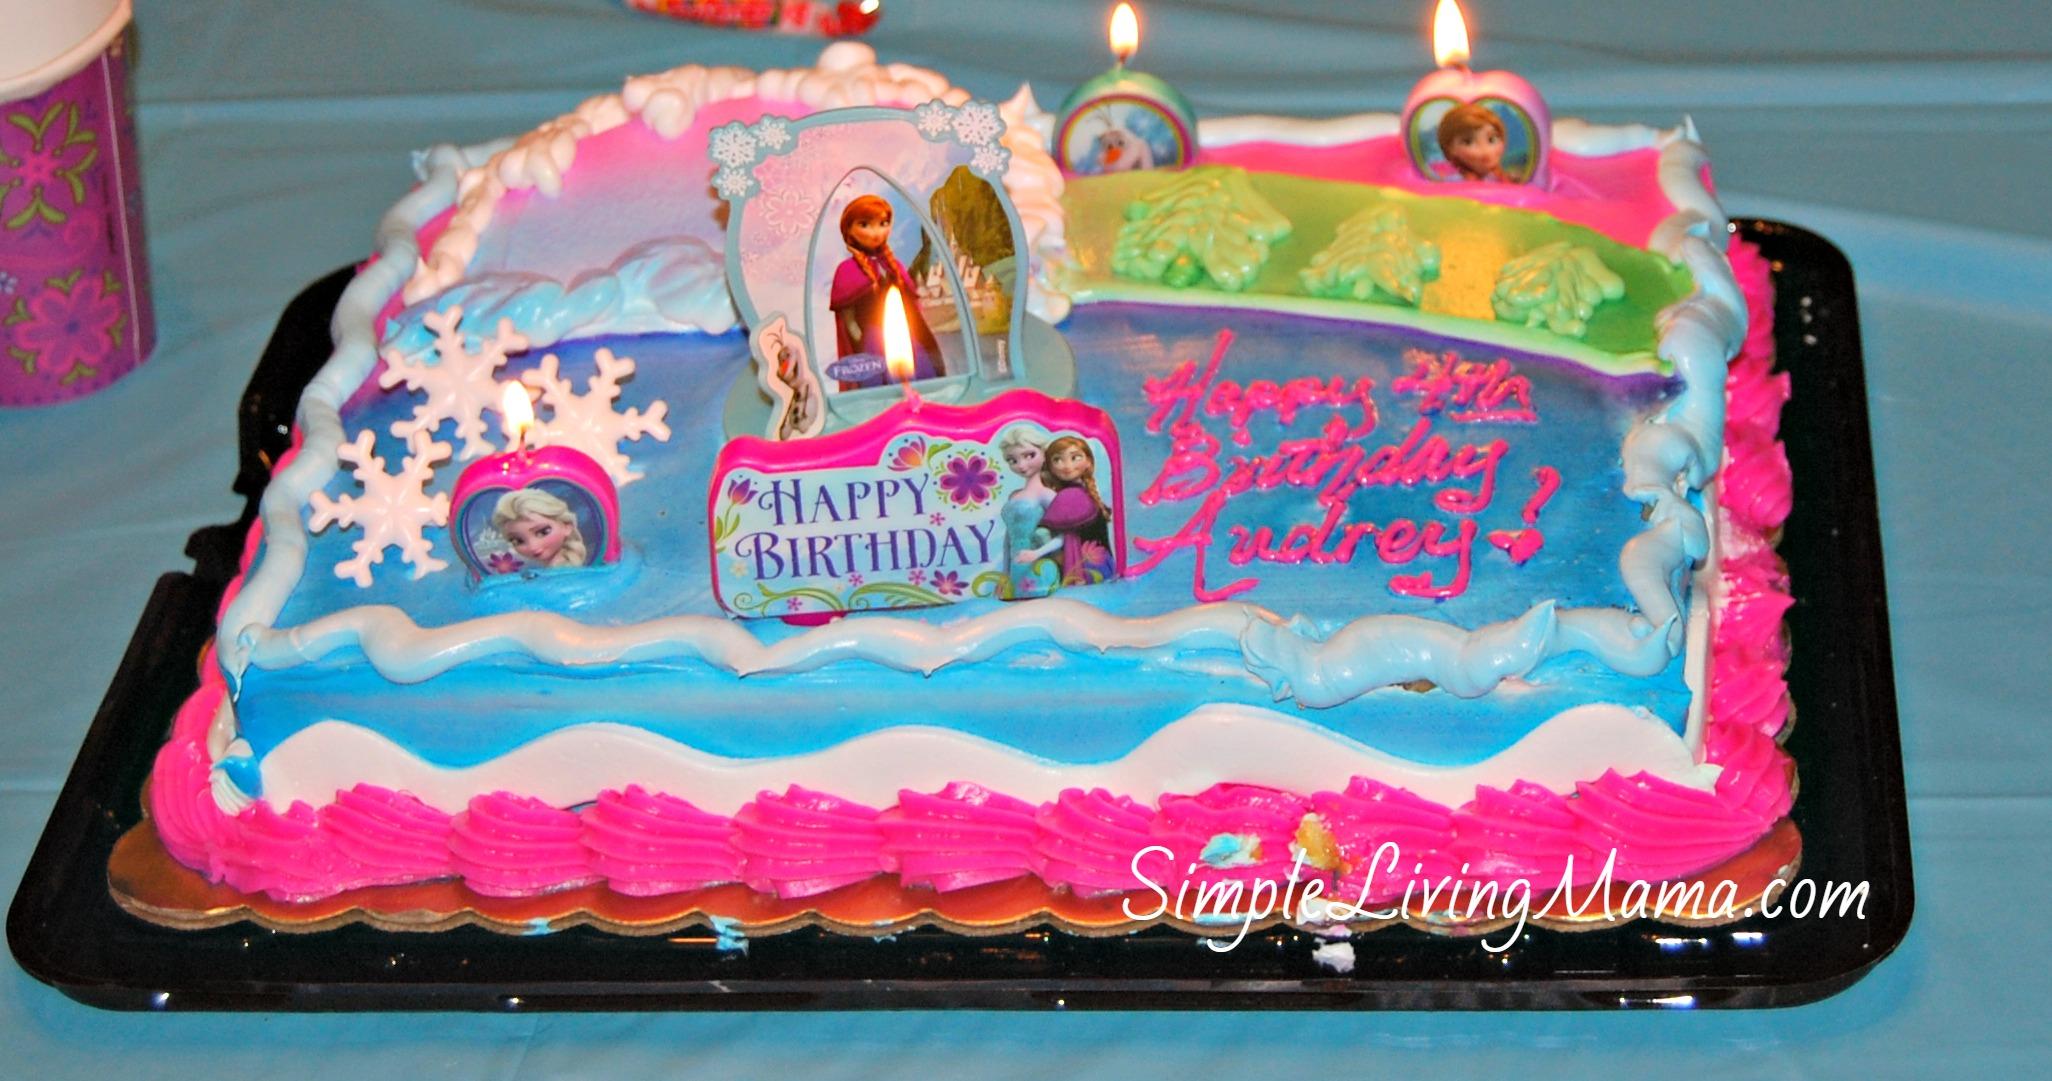 Kroger Specialty Cakes Kits Photo Frozen Birthday Jpg 2052x1081 Little Mermaid Cake